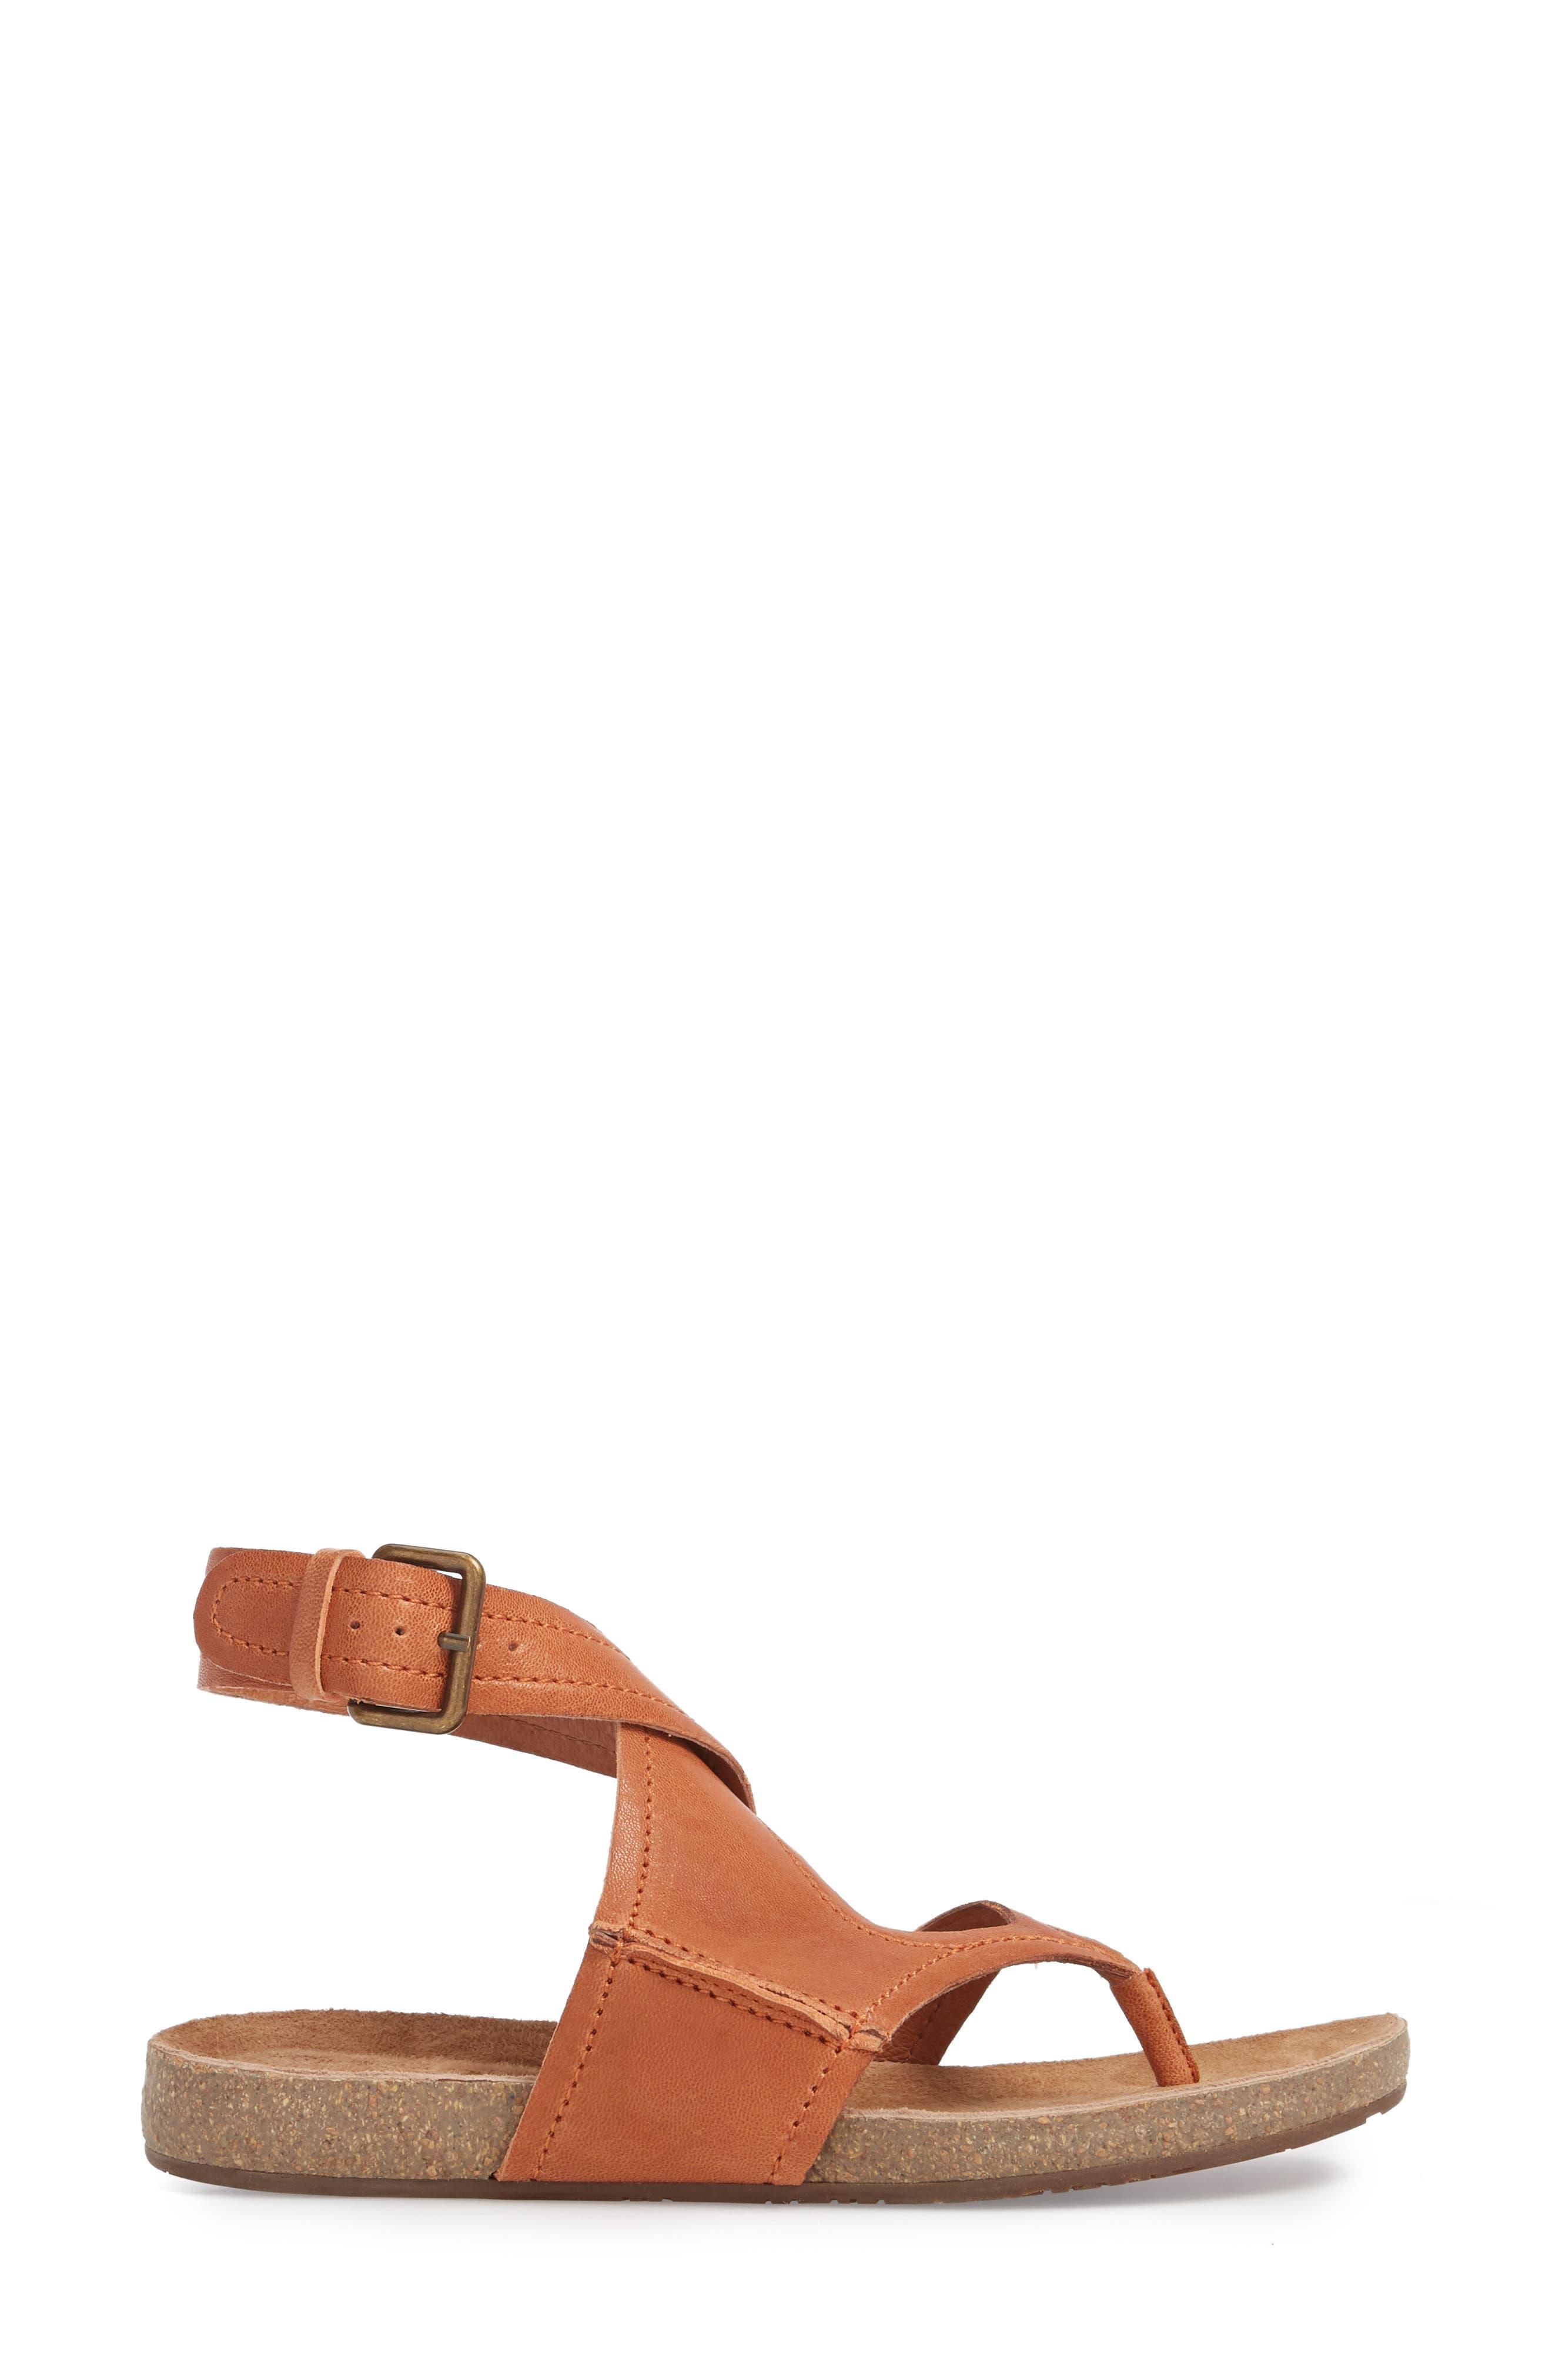 Yagger Sandal,                             Alternate thumbnail 3, color,                             Camel Leather